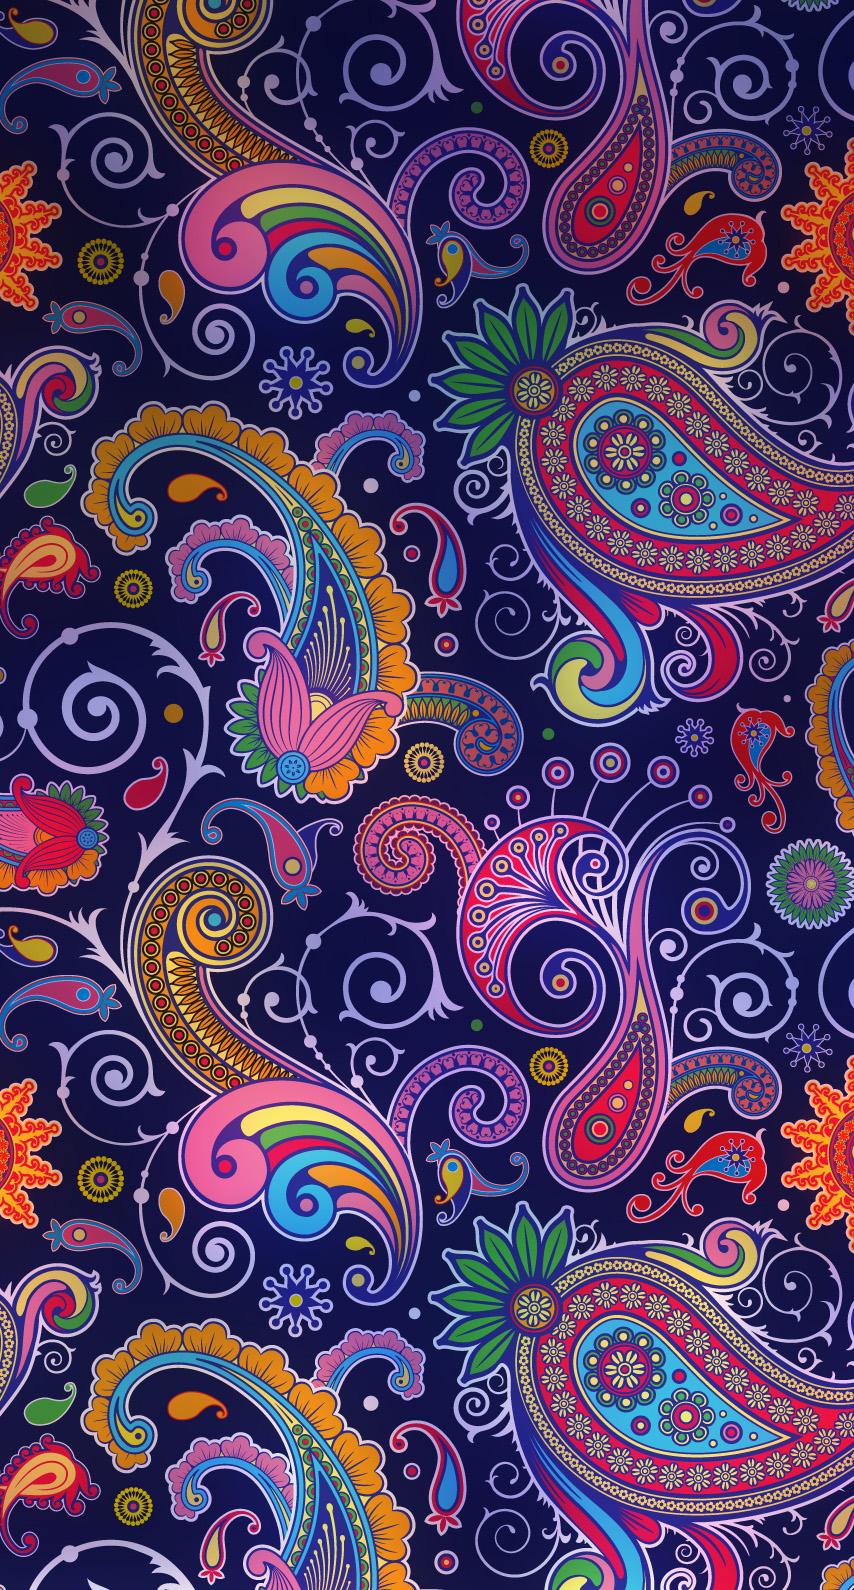 celebration, art, tile, graphic, design, wallpaper, illustration, decoration, element, fabric, vector